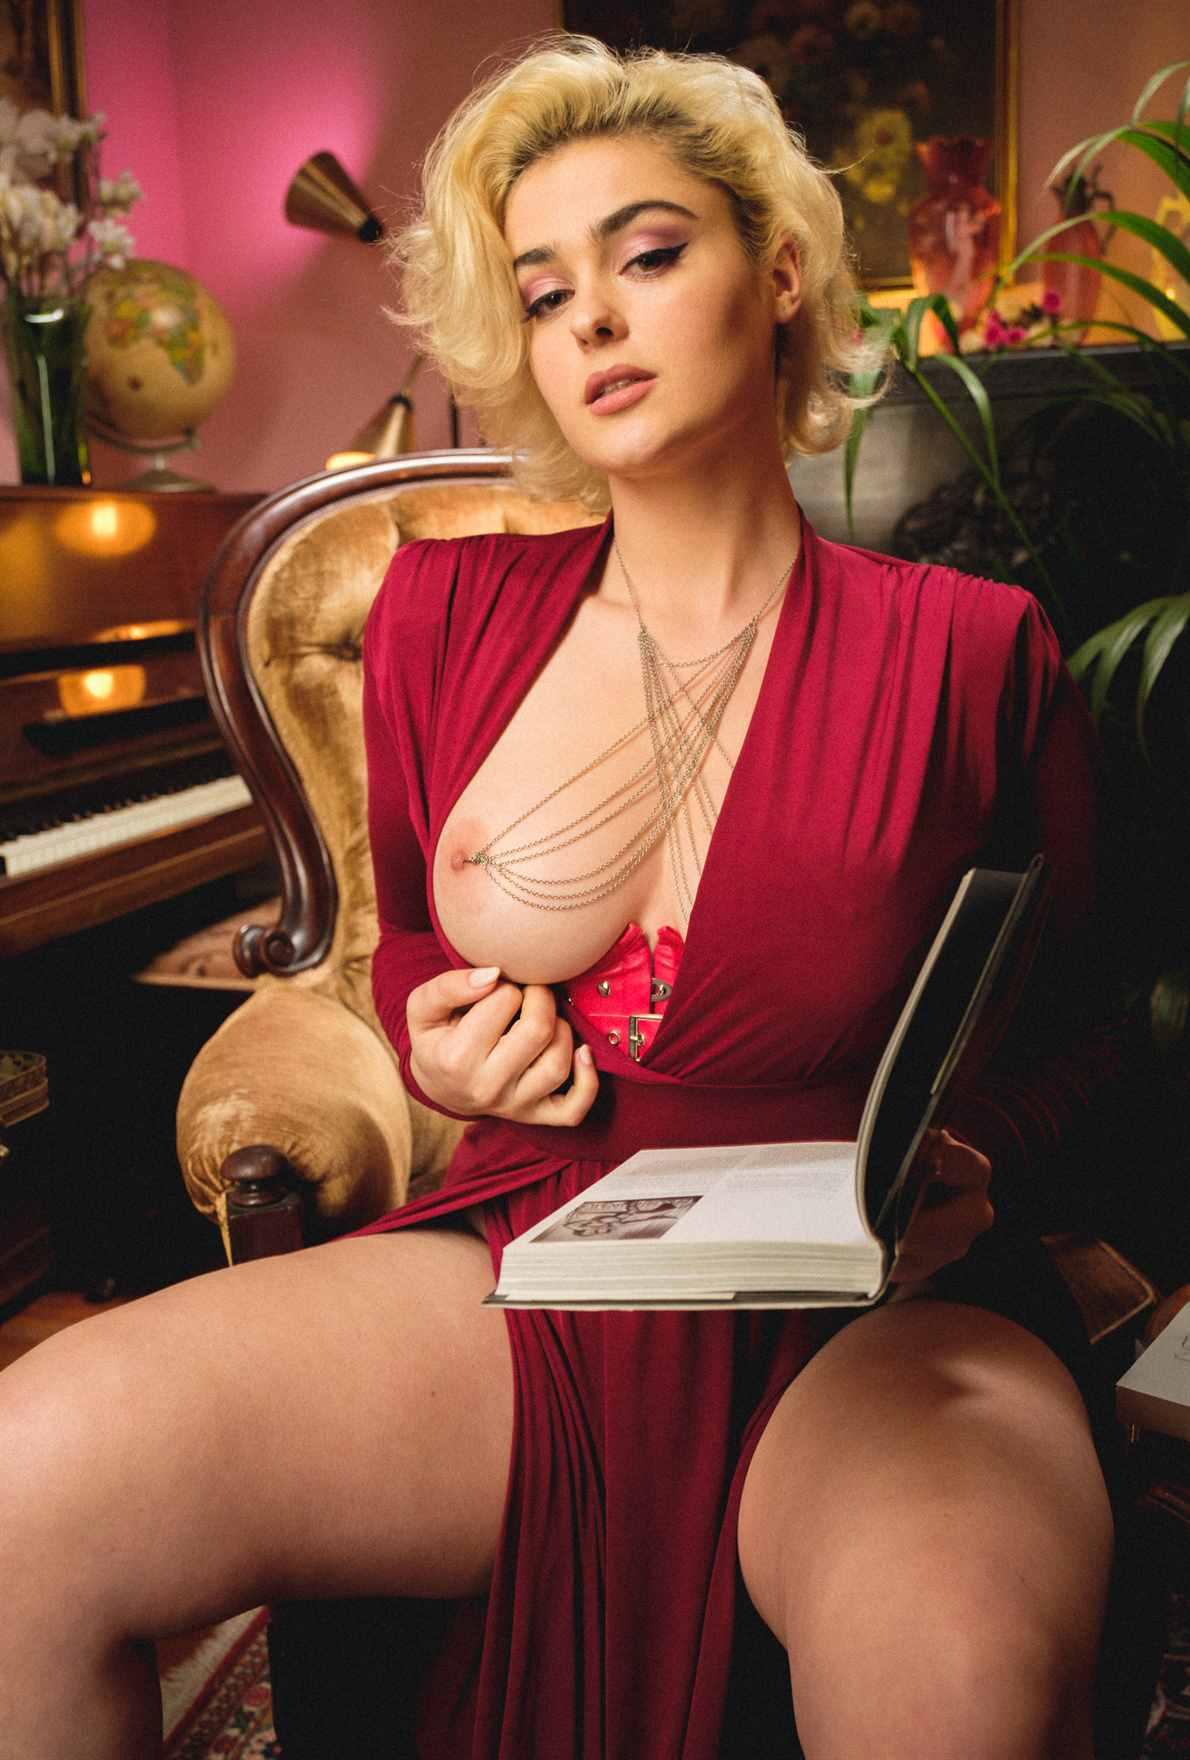 Stefania Ferrario Leaked Nude Photos 0023